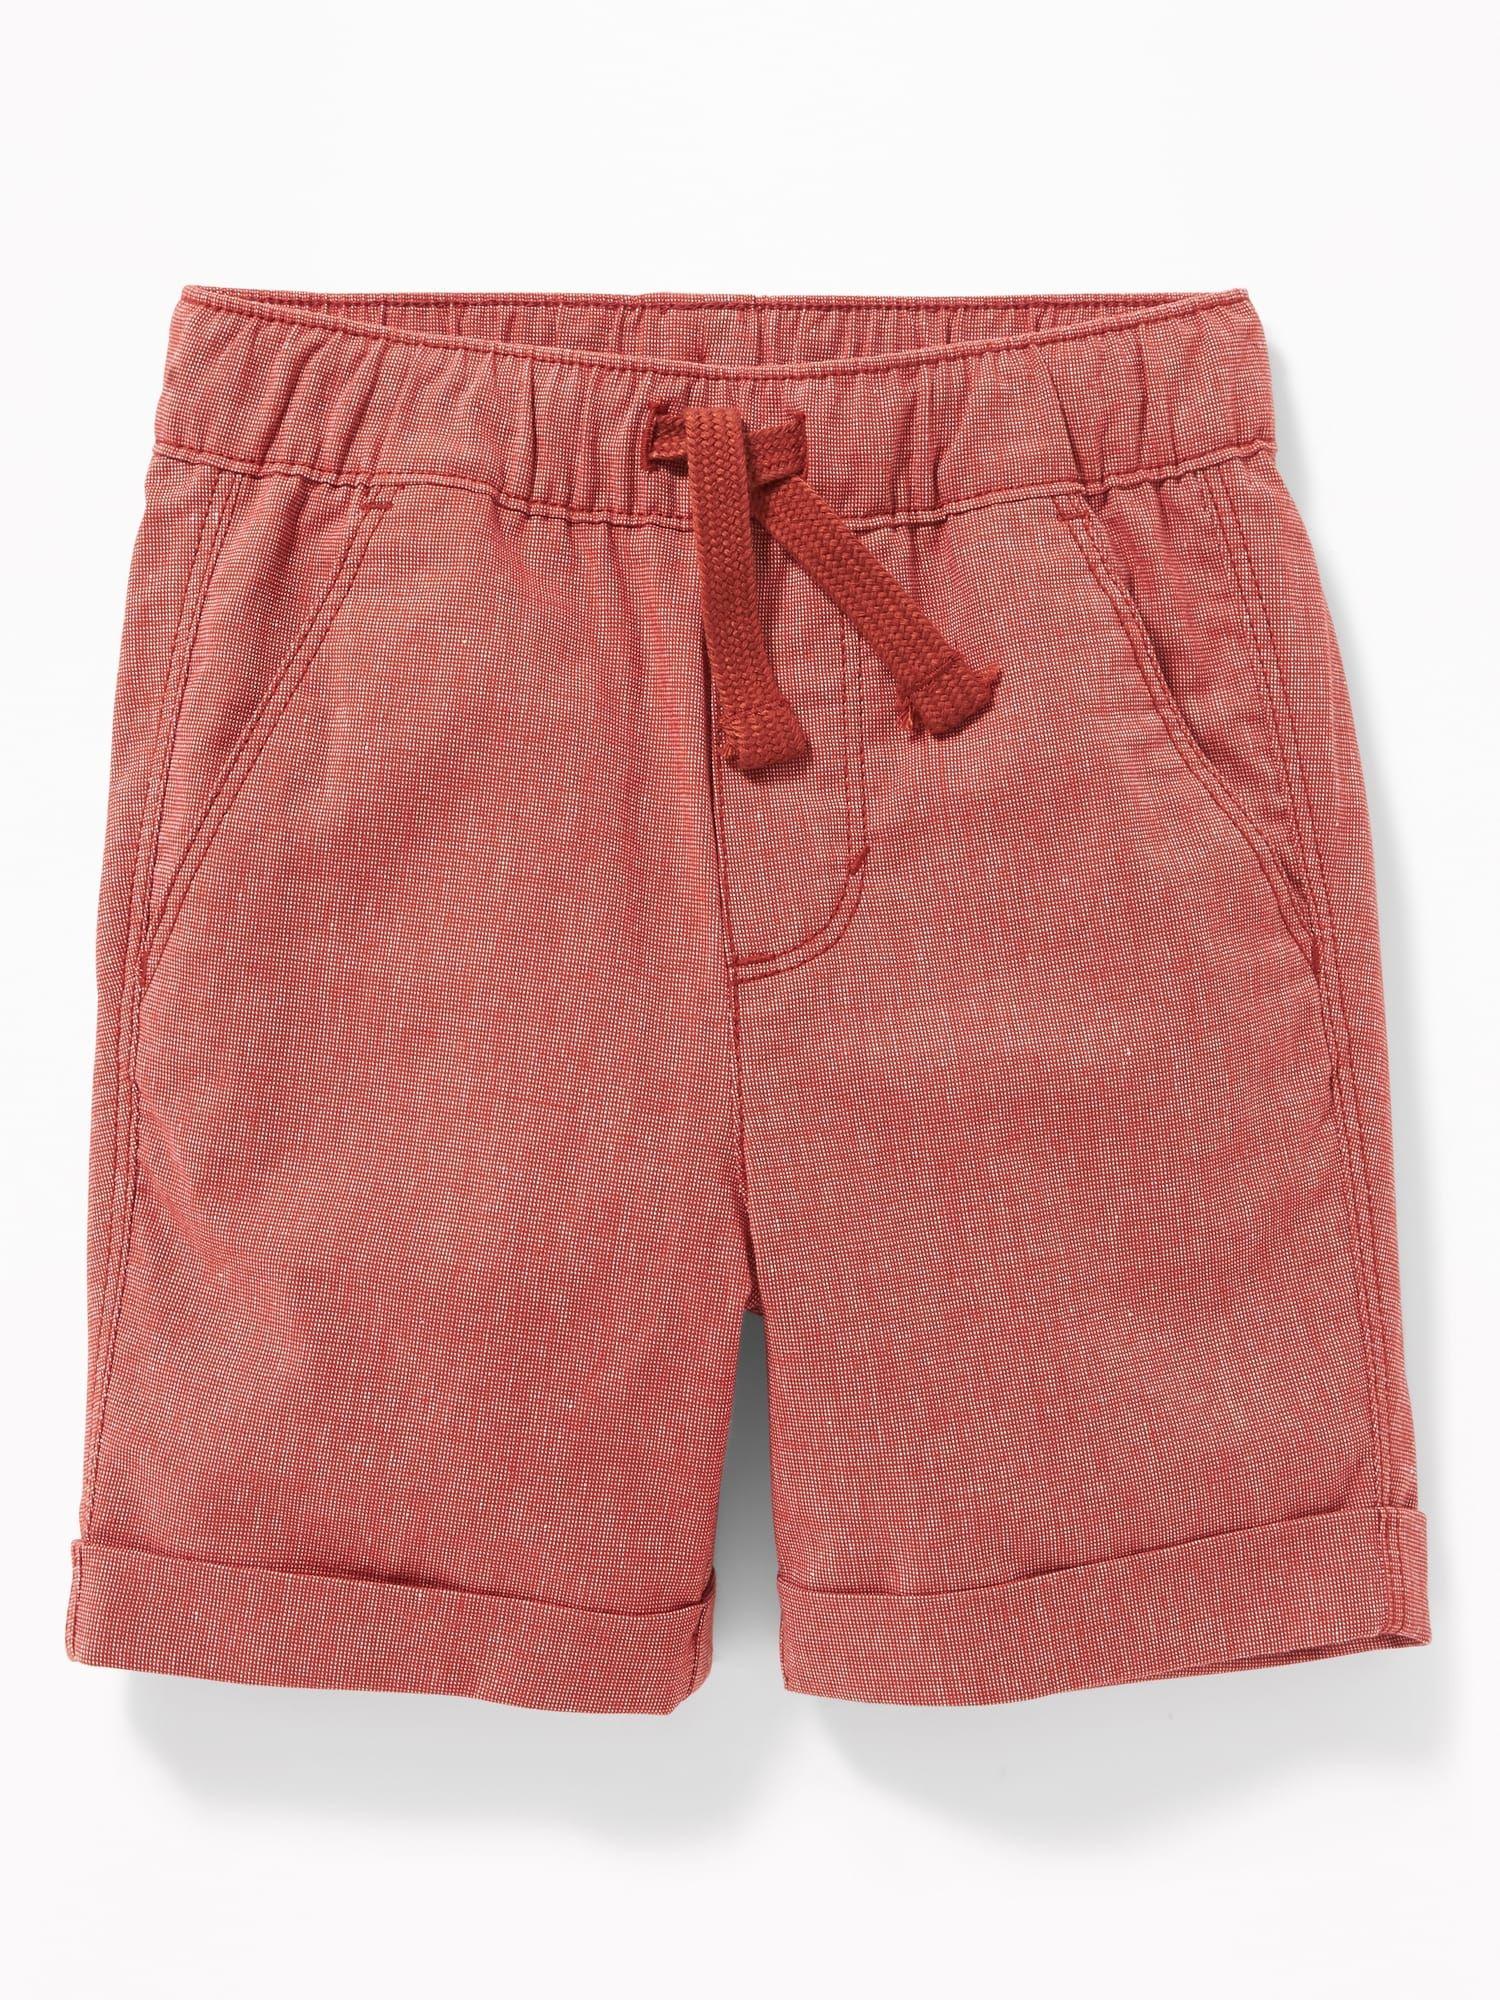 af06219c7ab Functional Drawstring Built-In Flex Pull-On Madras Shorts for Toddler Boys